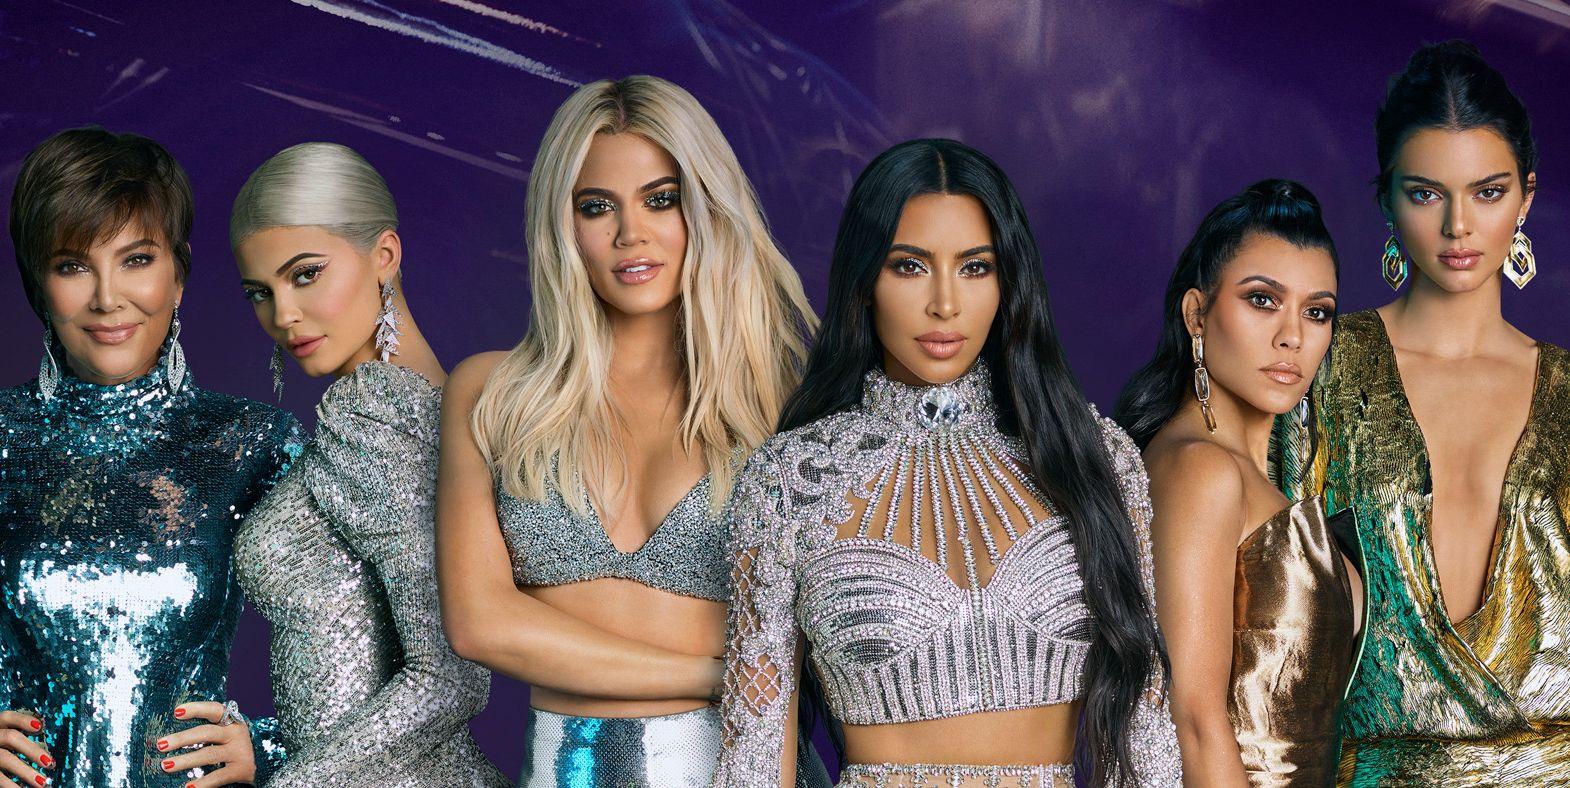 Keeping Up With The Kardashians confirms season 18 return date - Digital Spy